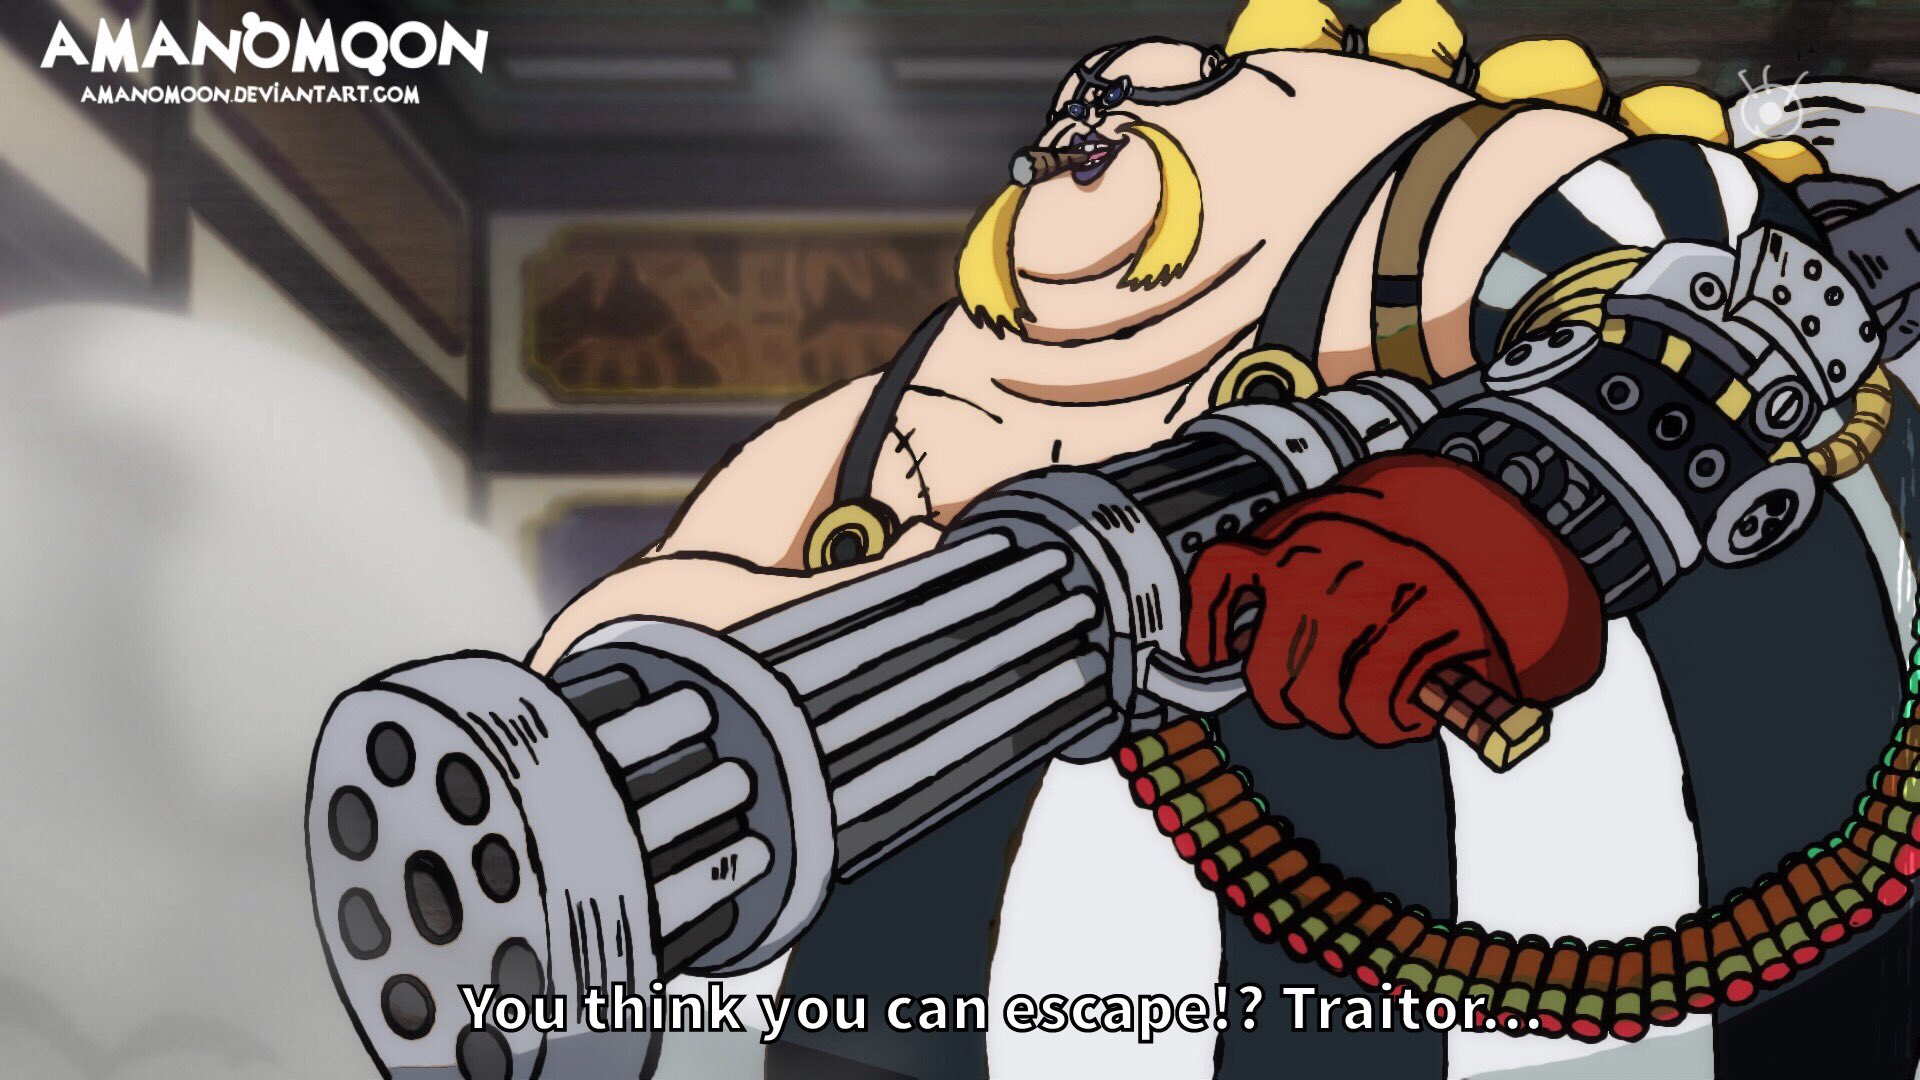 One Piece Chapter 991 Queen Gun Pisto Anime Style by Amanomoon on DeviantArt